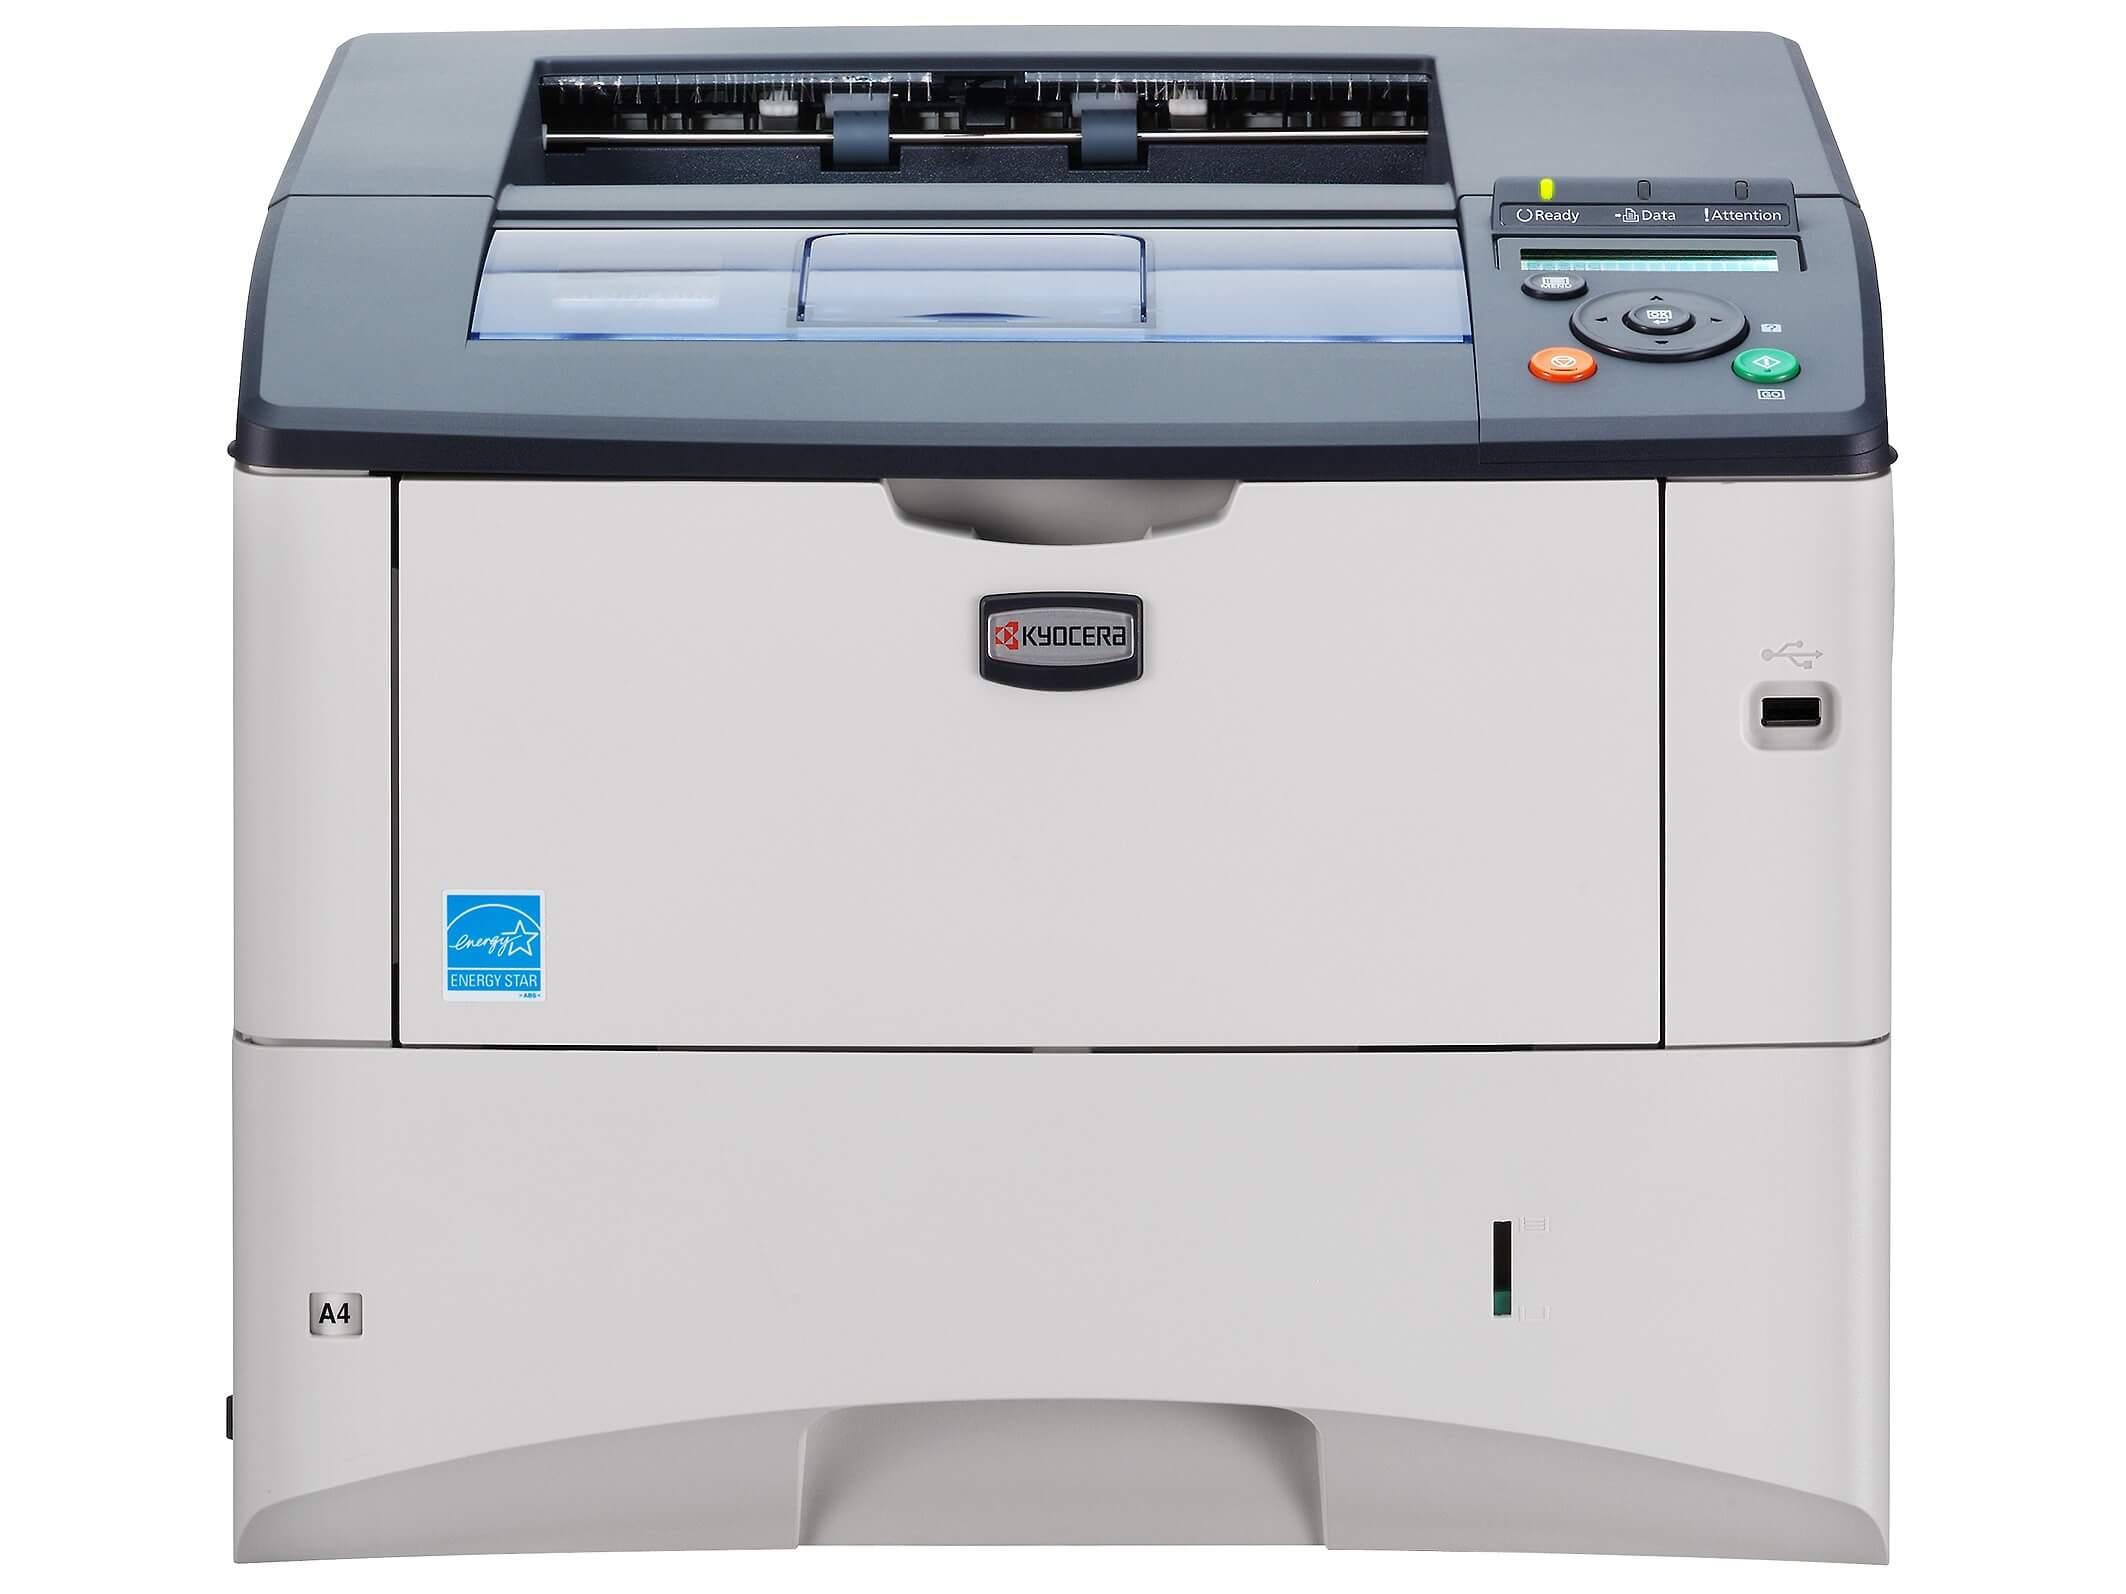 kyocera fs 2020 schwarz weiss laserdrucker. Black Bedroom Furniture Sets. Home Design Ideas